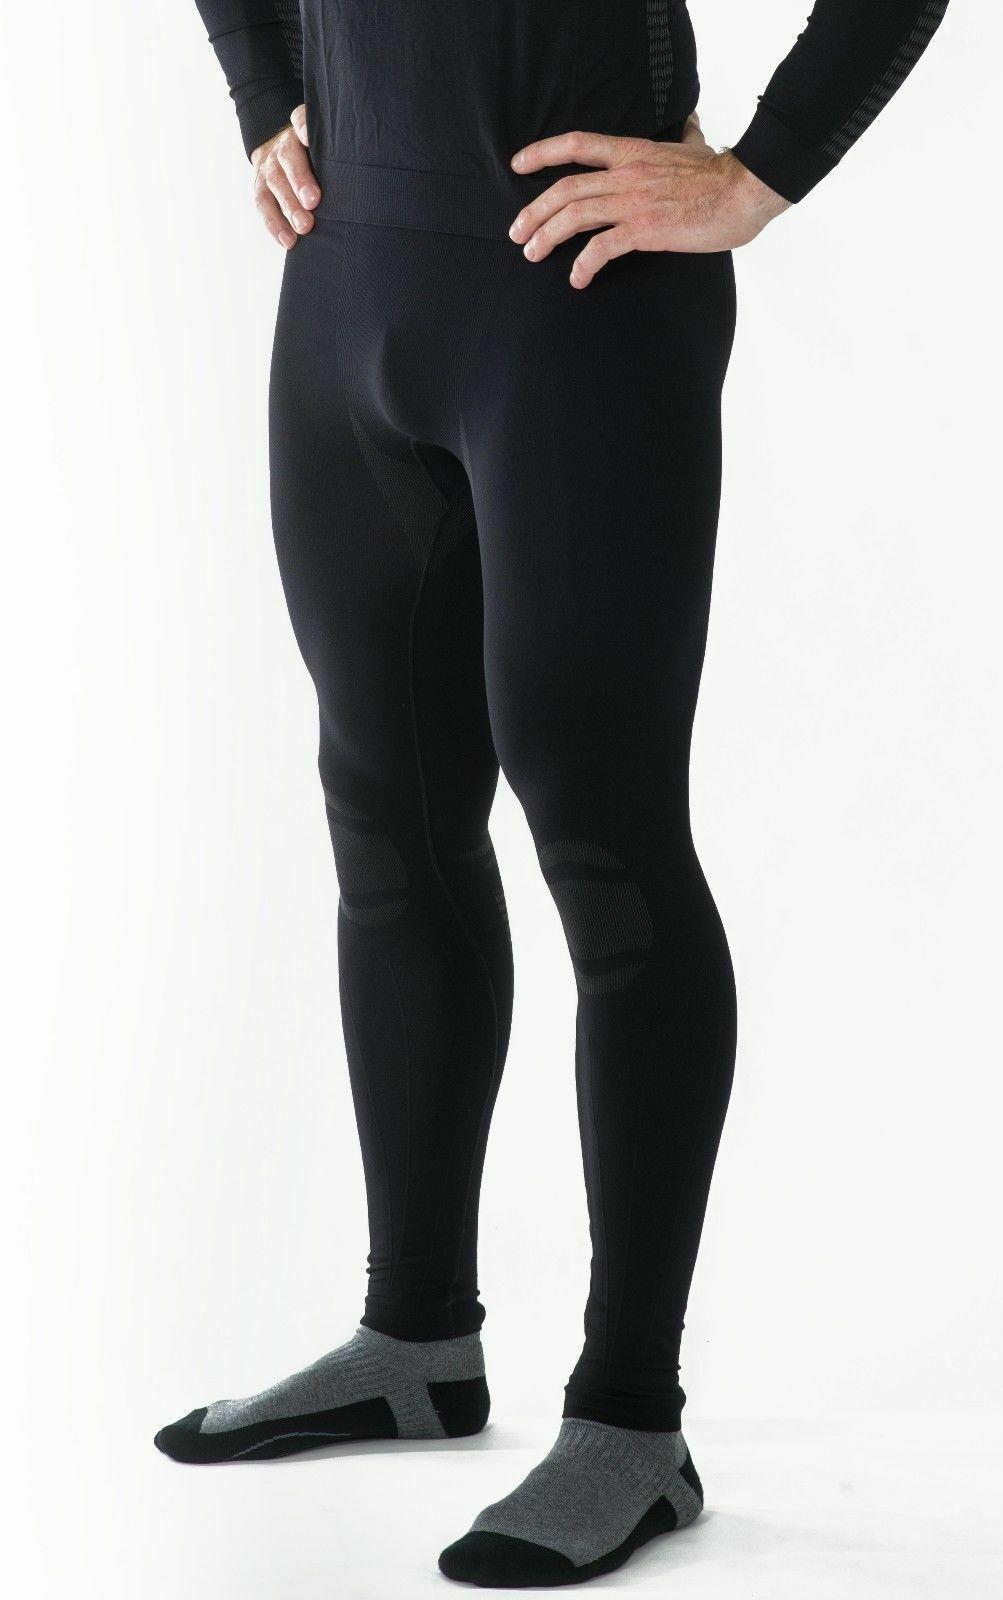 Issimo-Men-039-s-Sports-Stretchy-Leggings-Moisture-Wicking-Training-Pants thumbnail 8